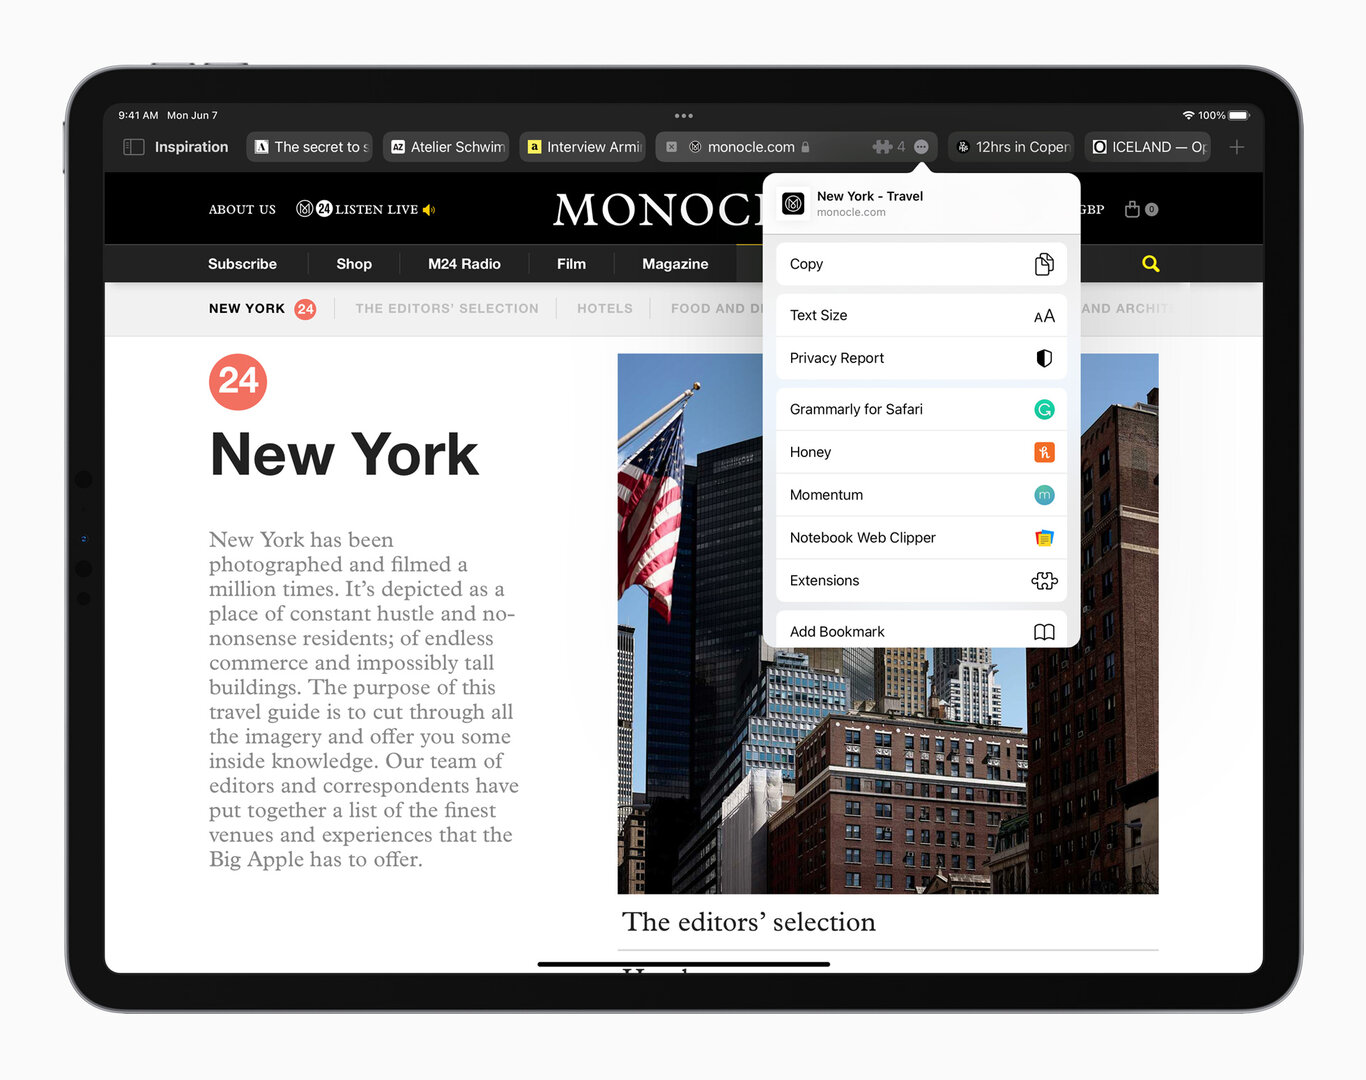 La nueva vista compacta en el navegador Safari